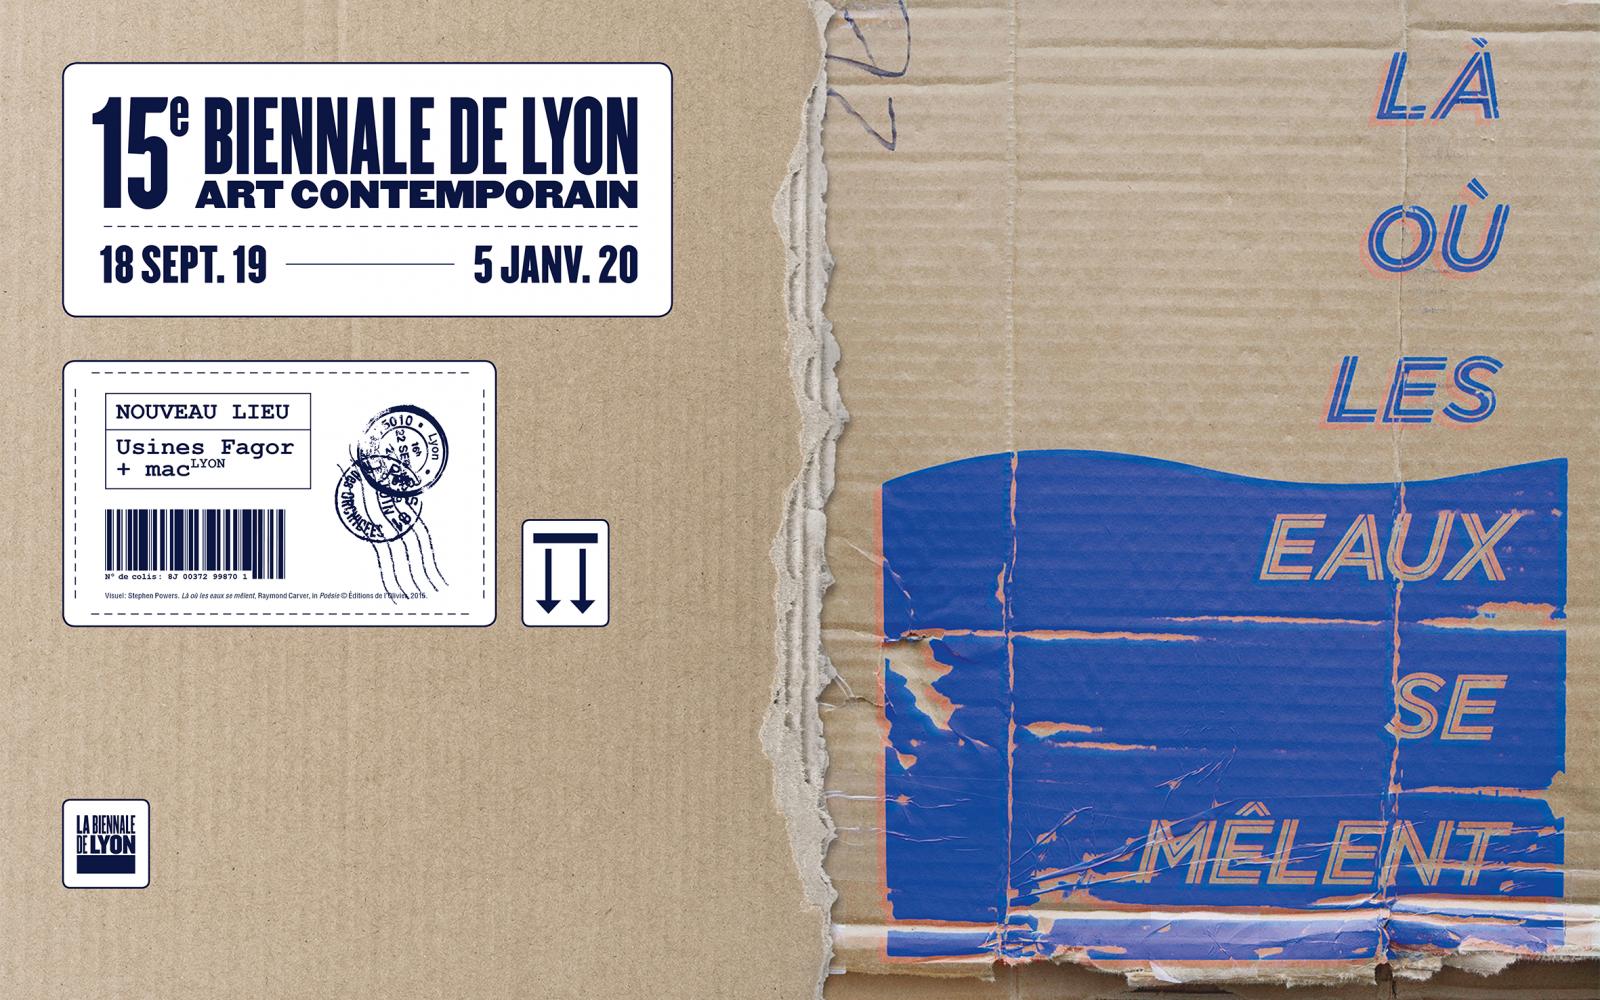 Lyon's 15th biennial contemporary art event